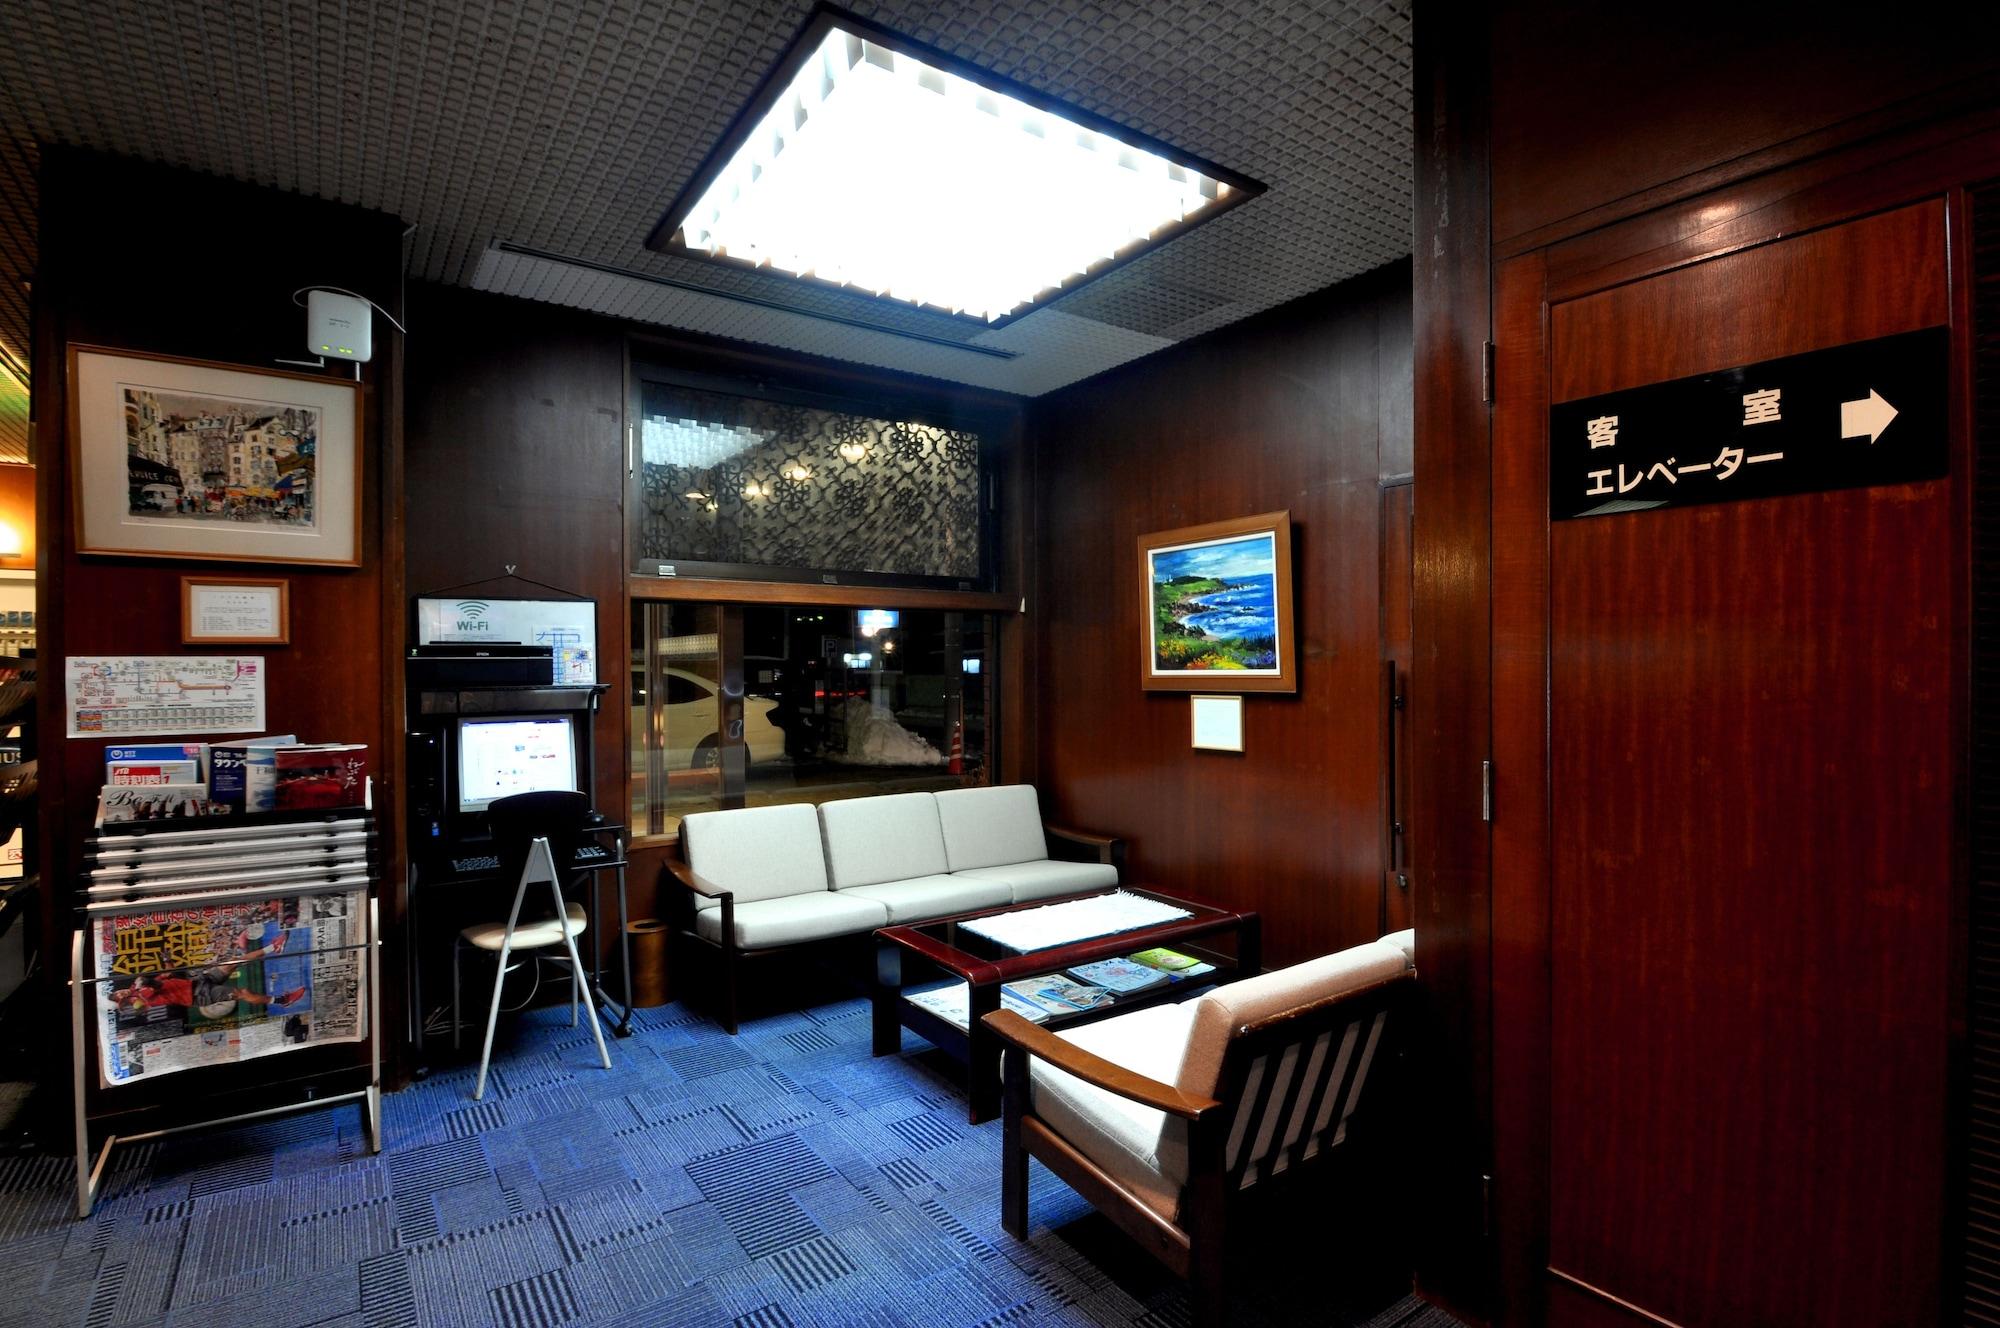 City Park Hotel Hachinohe, Hachinohe